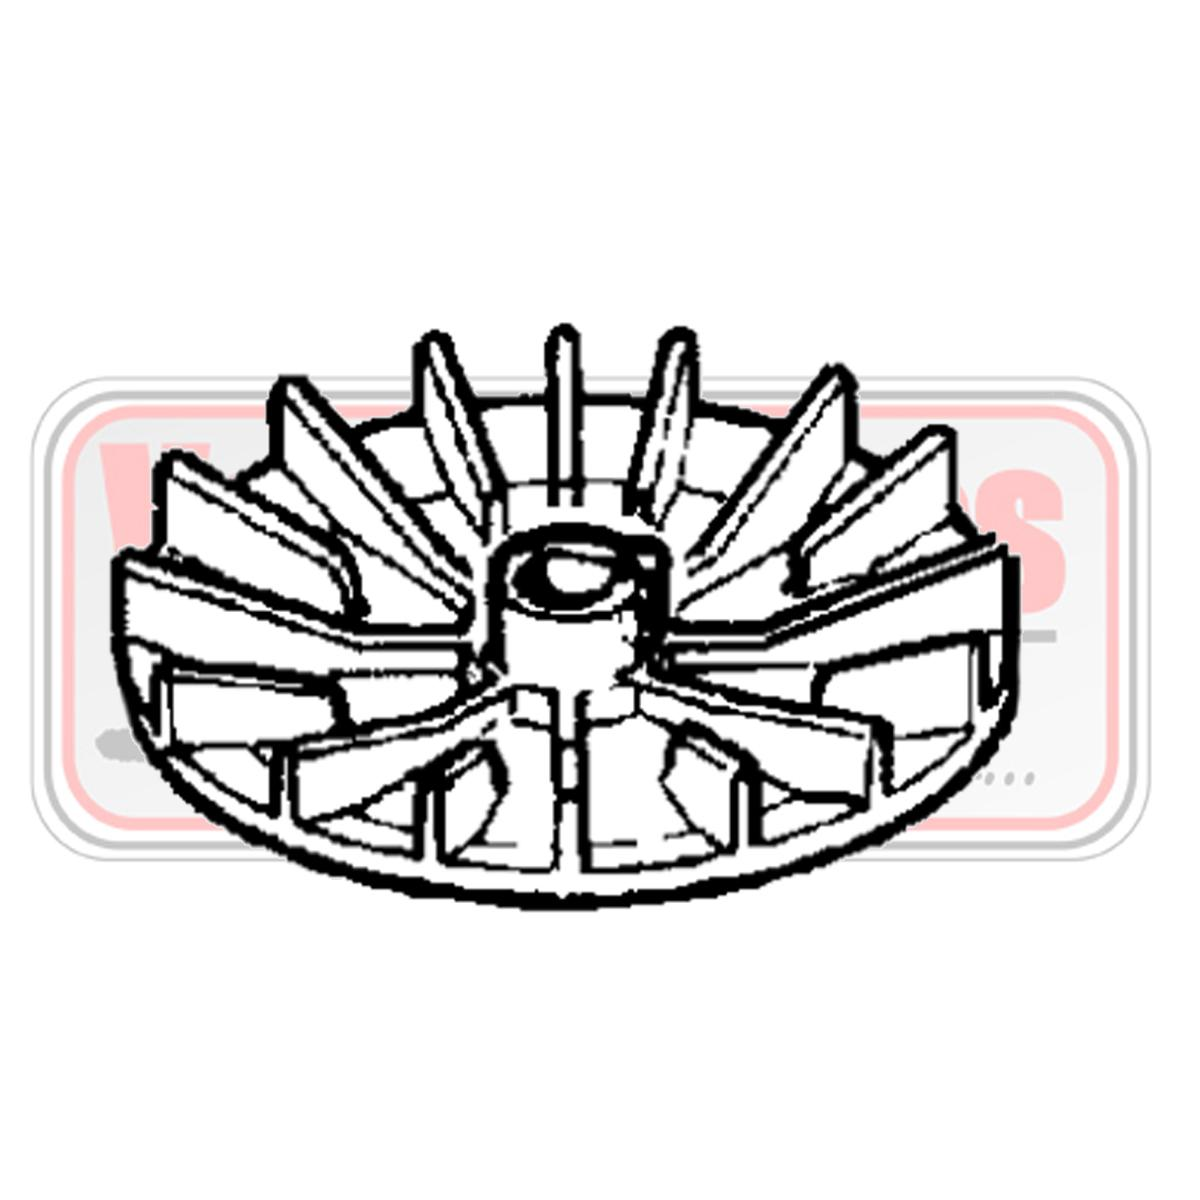 Ventilador, soporte cuchilla Oleo Mac G 44 / 48 PE - GE 43 / 47